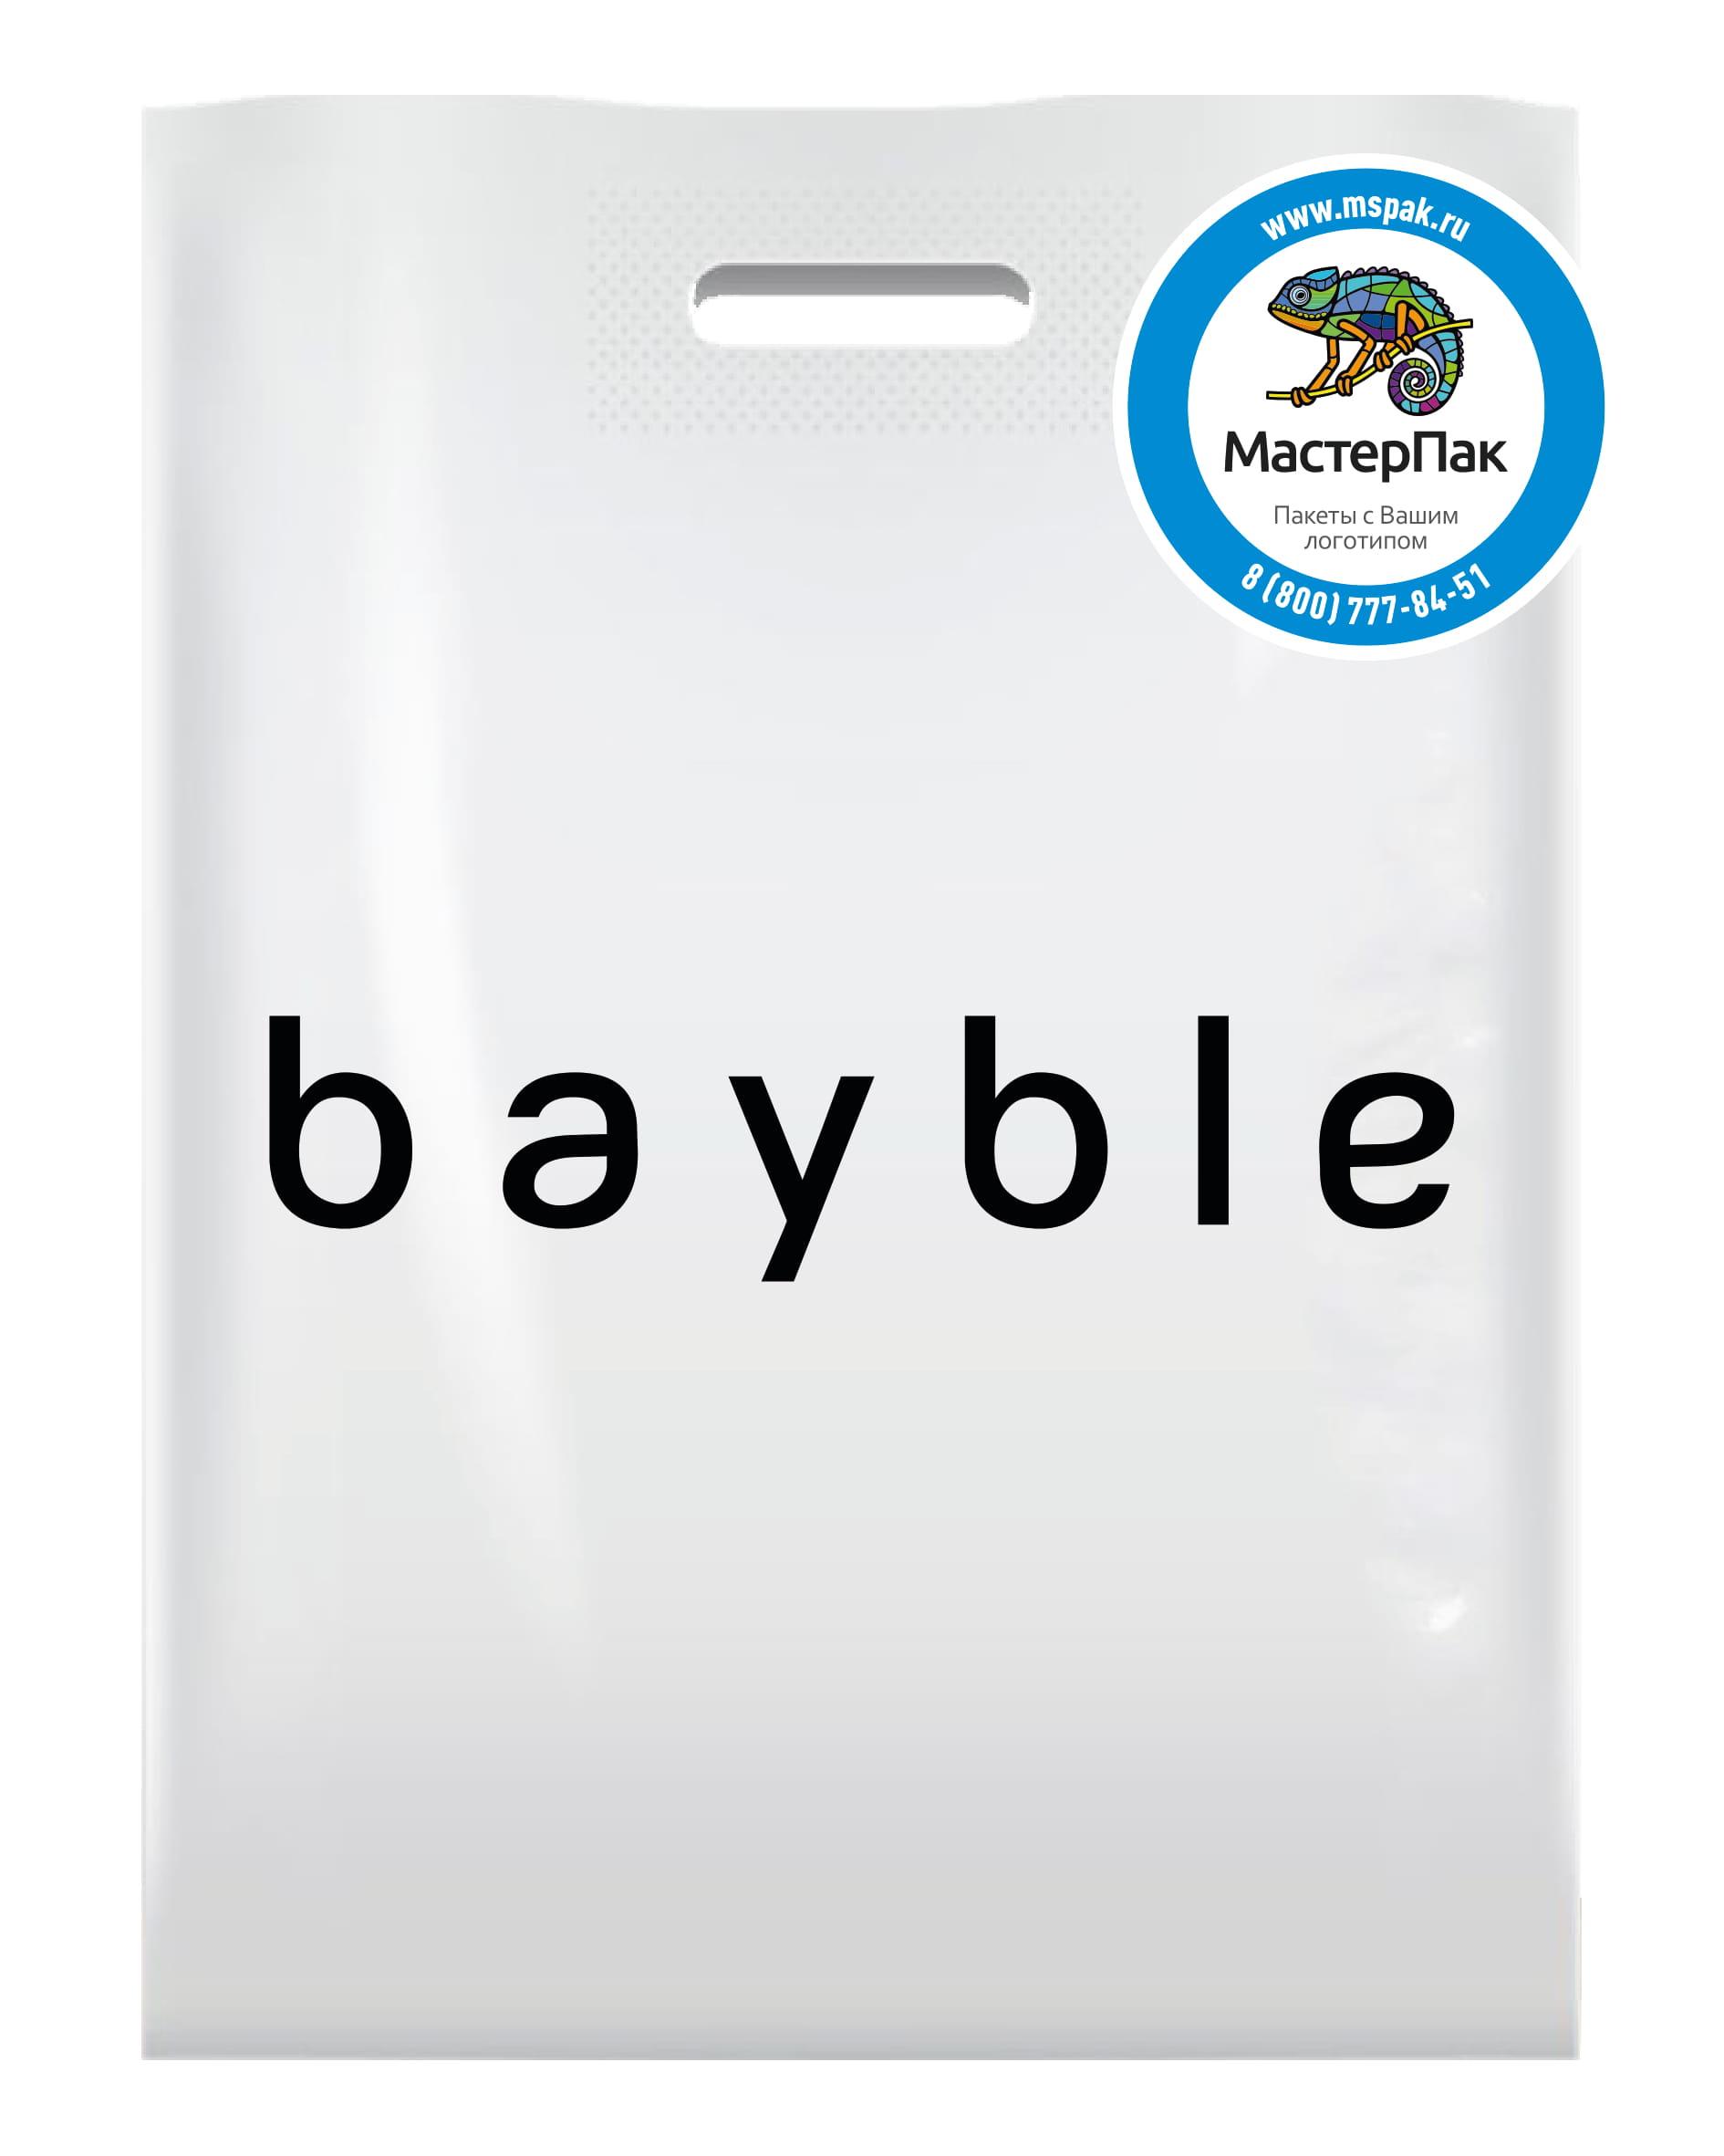 Пакет ПВД с логотипом bayble, 70 мкм, 30*40, белый